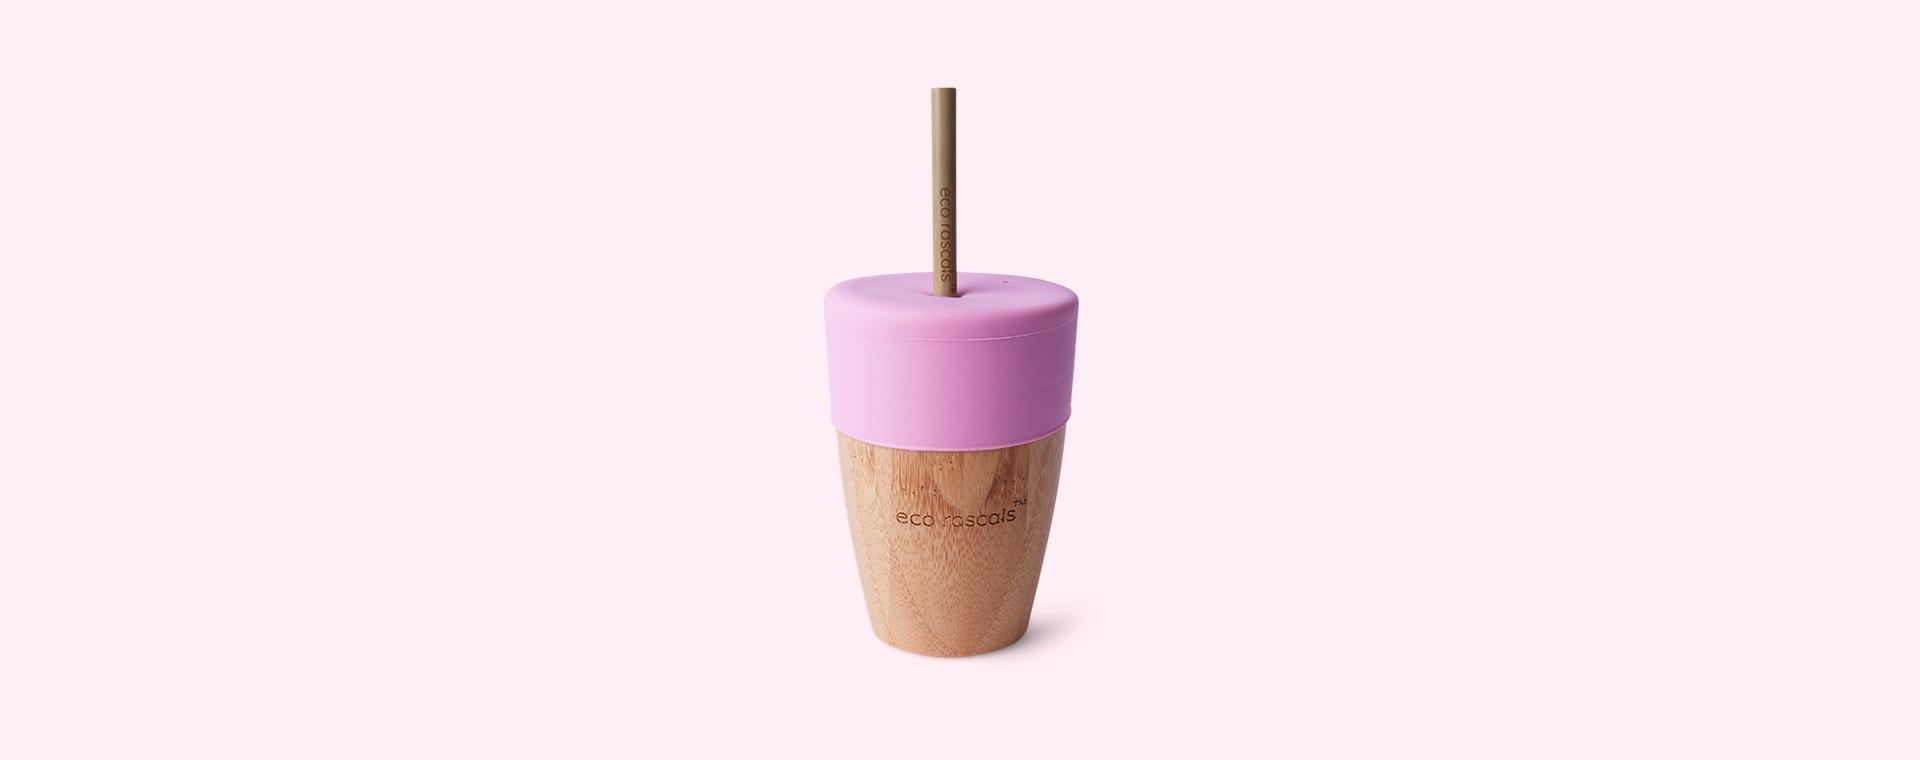 Pink eco rascals Big Cup, Topper & Straws